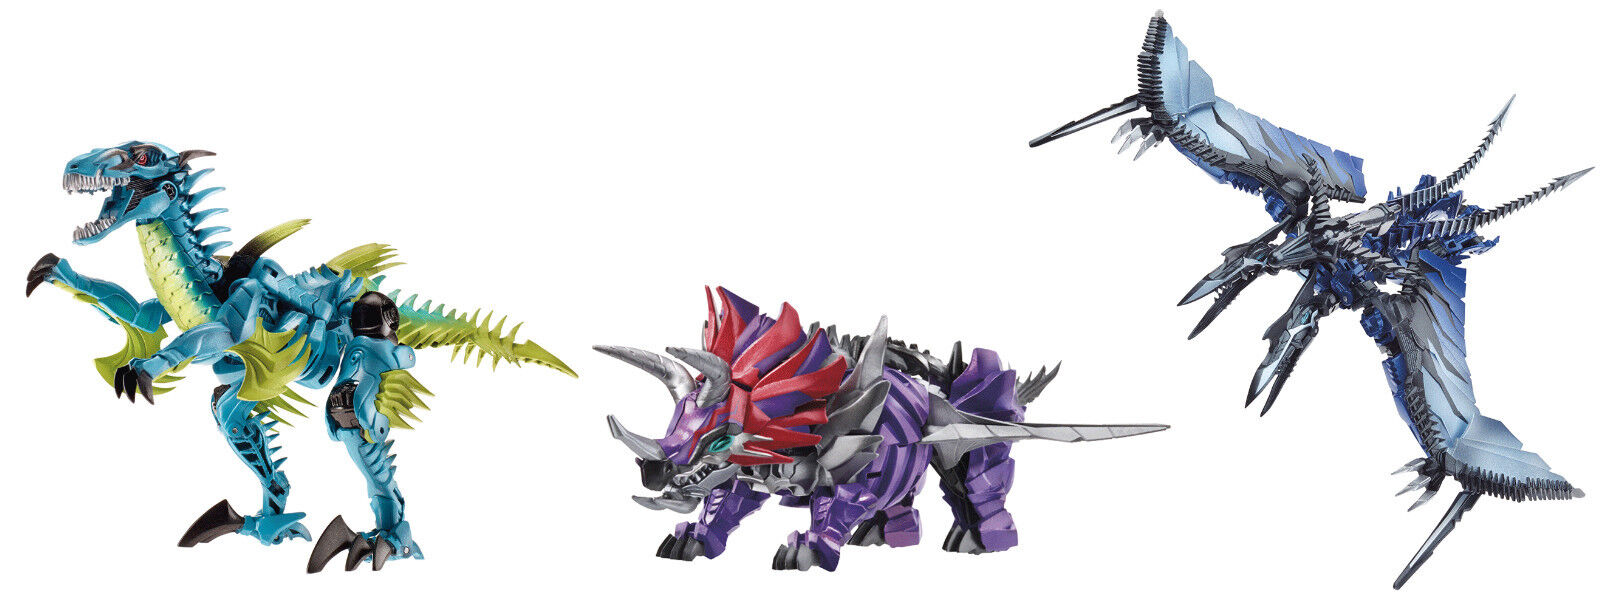 Transformers  age of extinction dinobots slash + strafe + slug action figures new